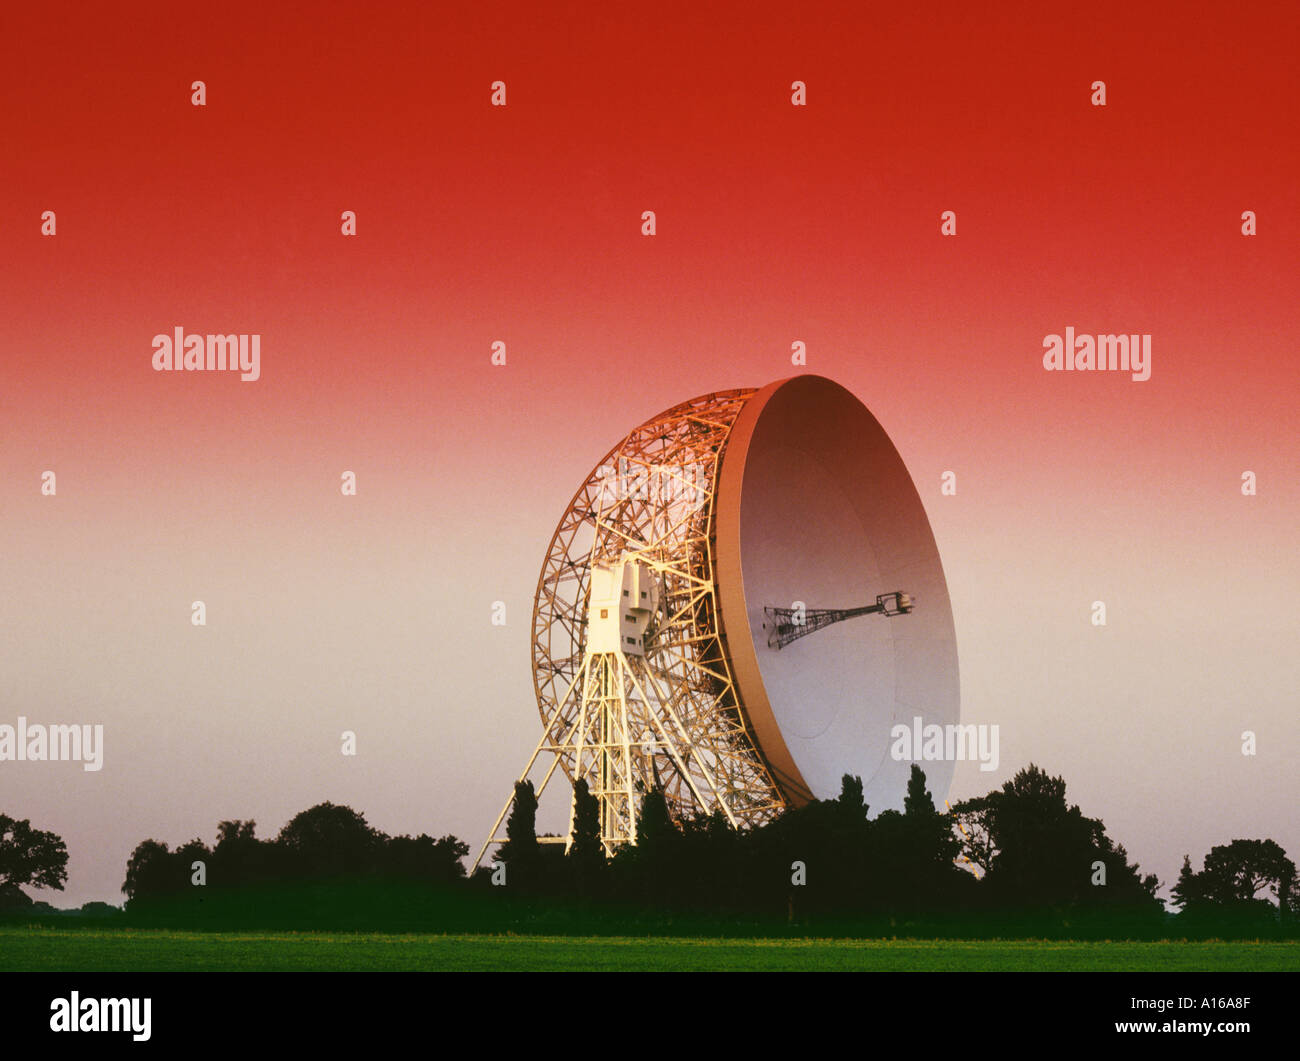 Astronomy - Jodrel Bank radio telescope - England - Stock Image